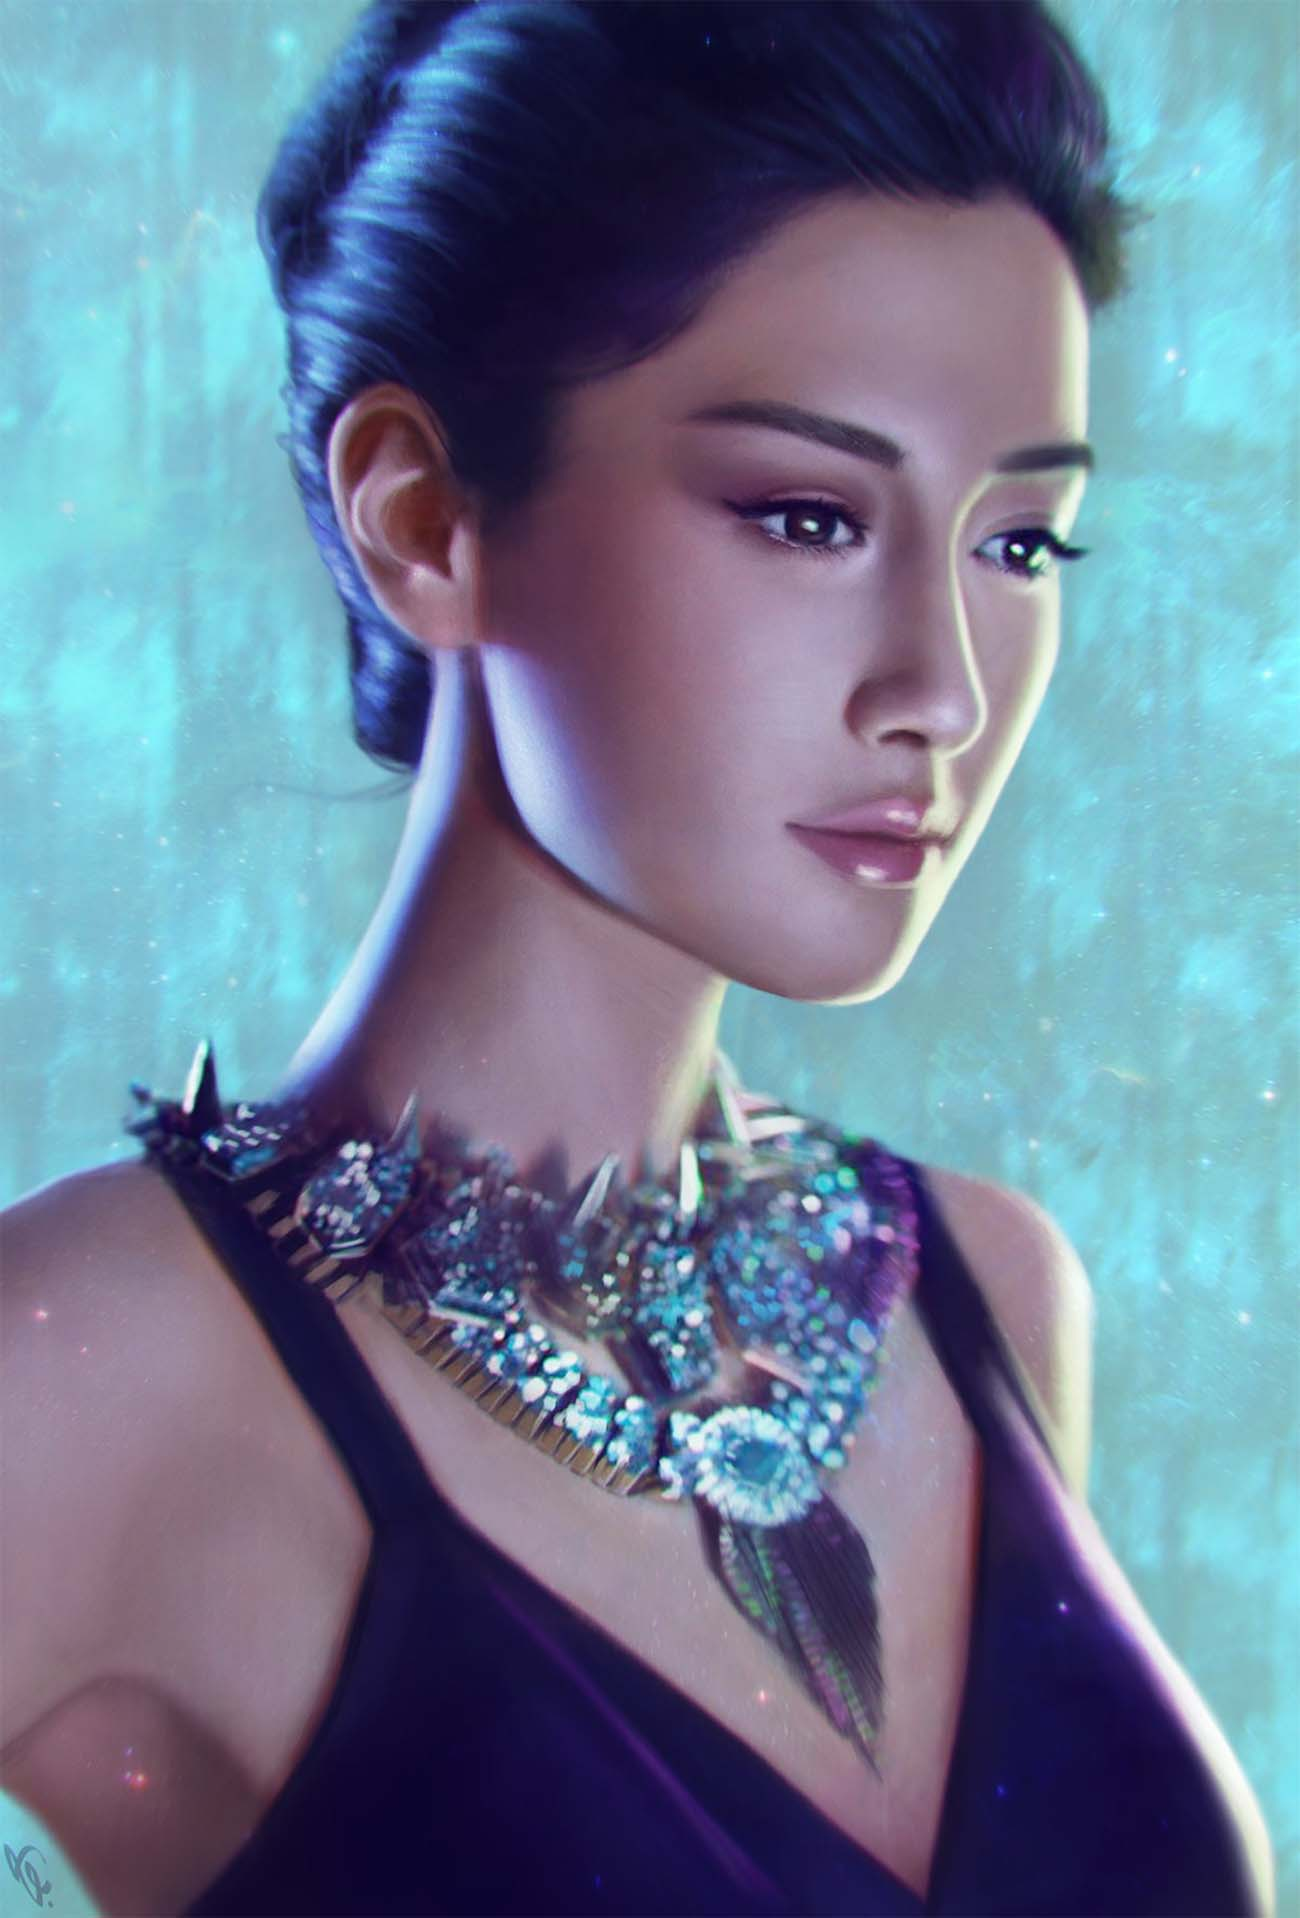 Angel Ganev | Paintable.cc Digital Painting Inspiration - Learn the Art of Digital Painting! #digitalpainting #digitalart